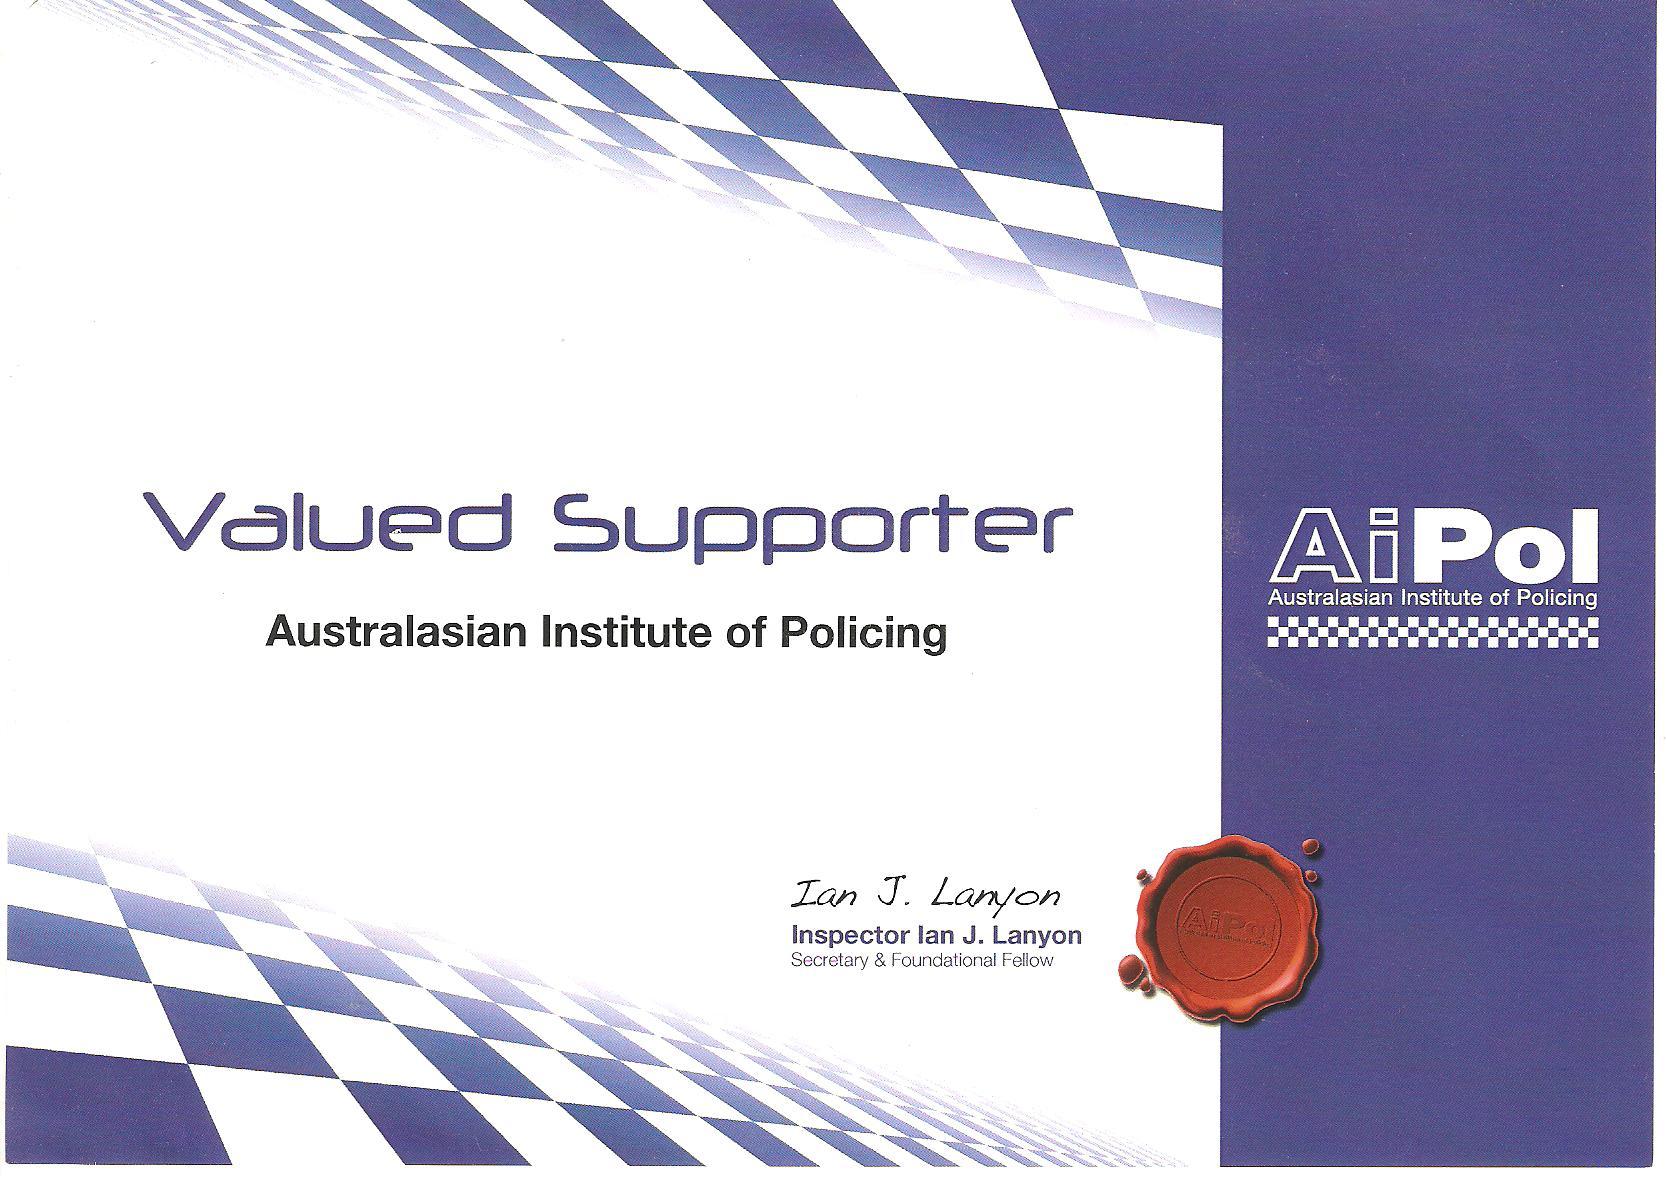 Aipol Certificate 001.jpg